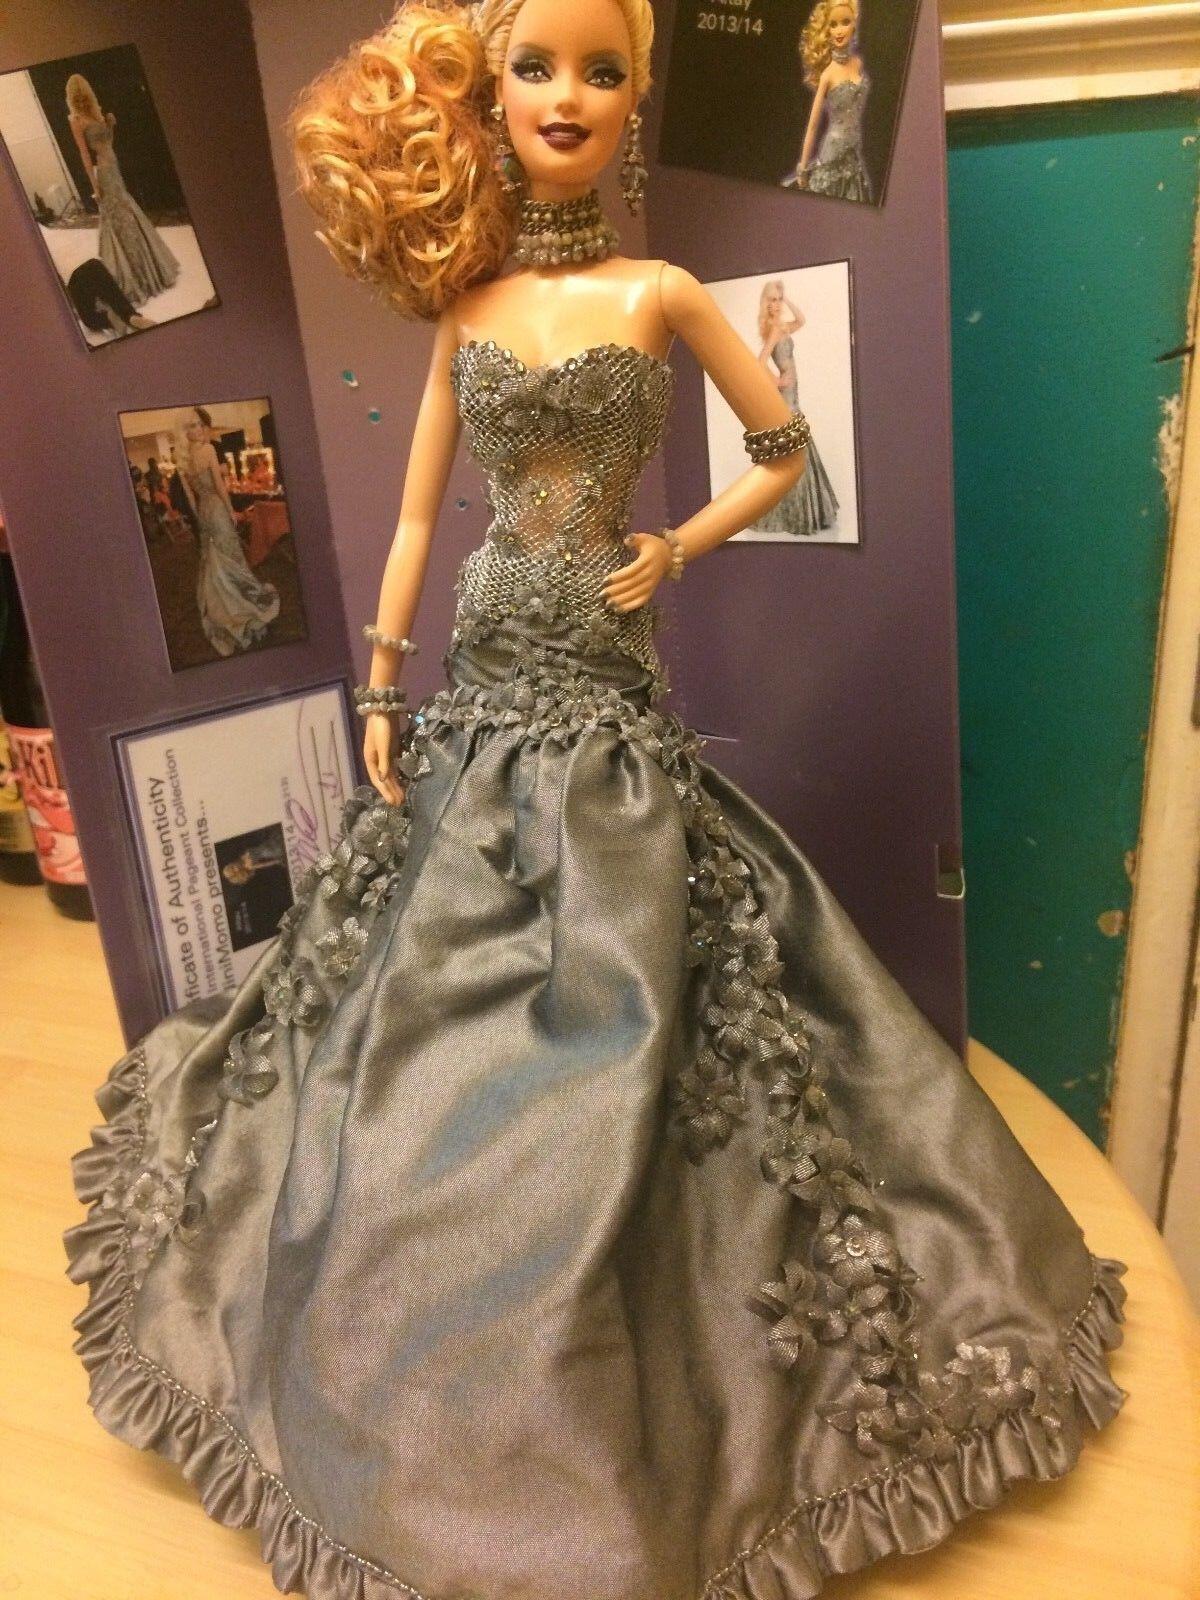 Ninimomo 'One of a Kind , Miss Sudamérica muñeca Barbie, Exquisito